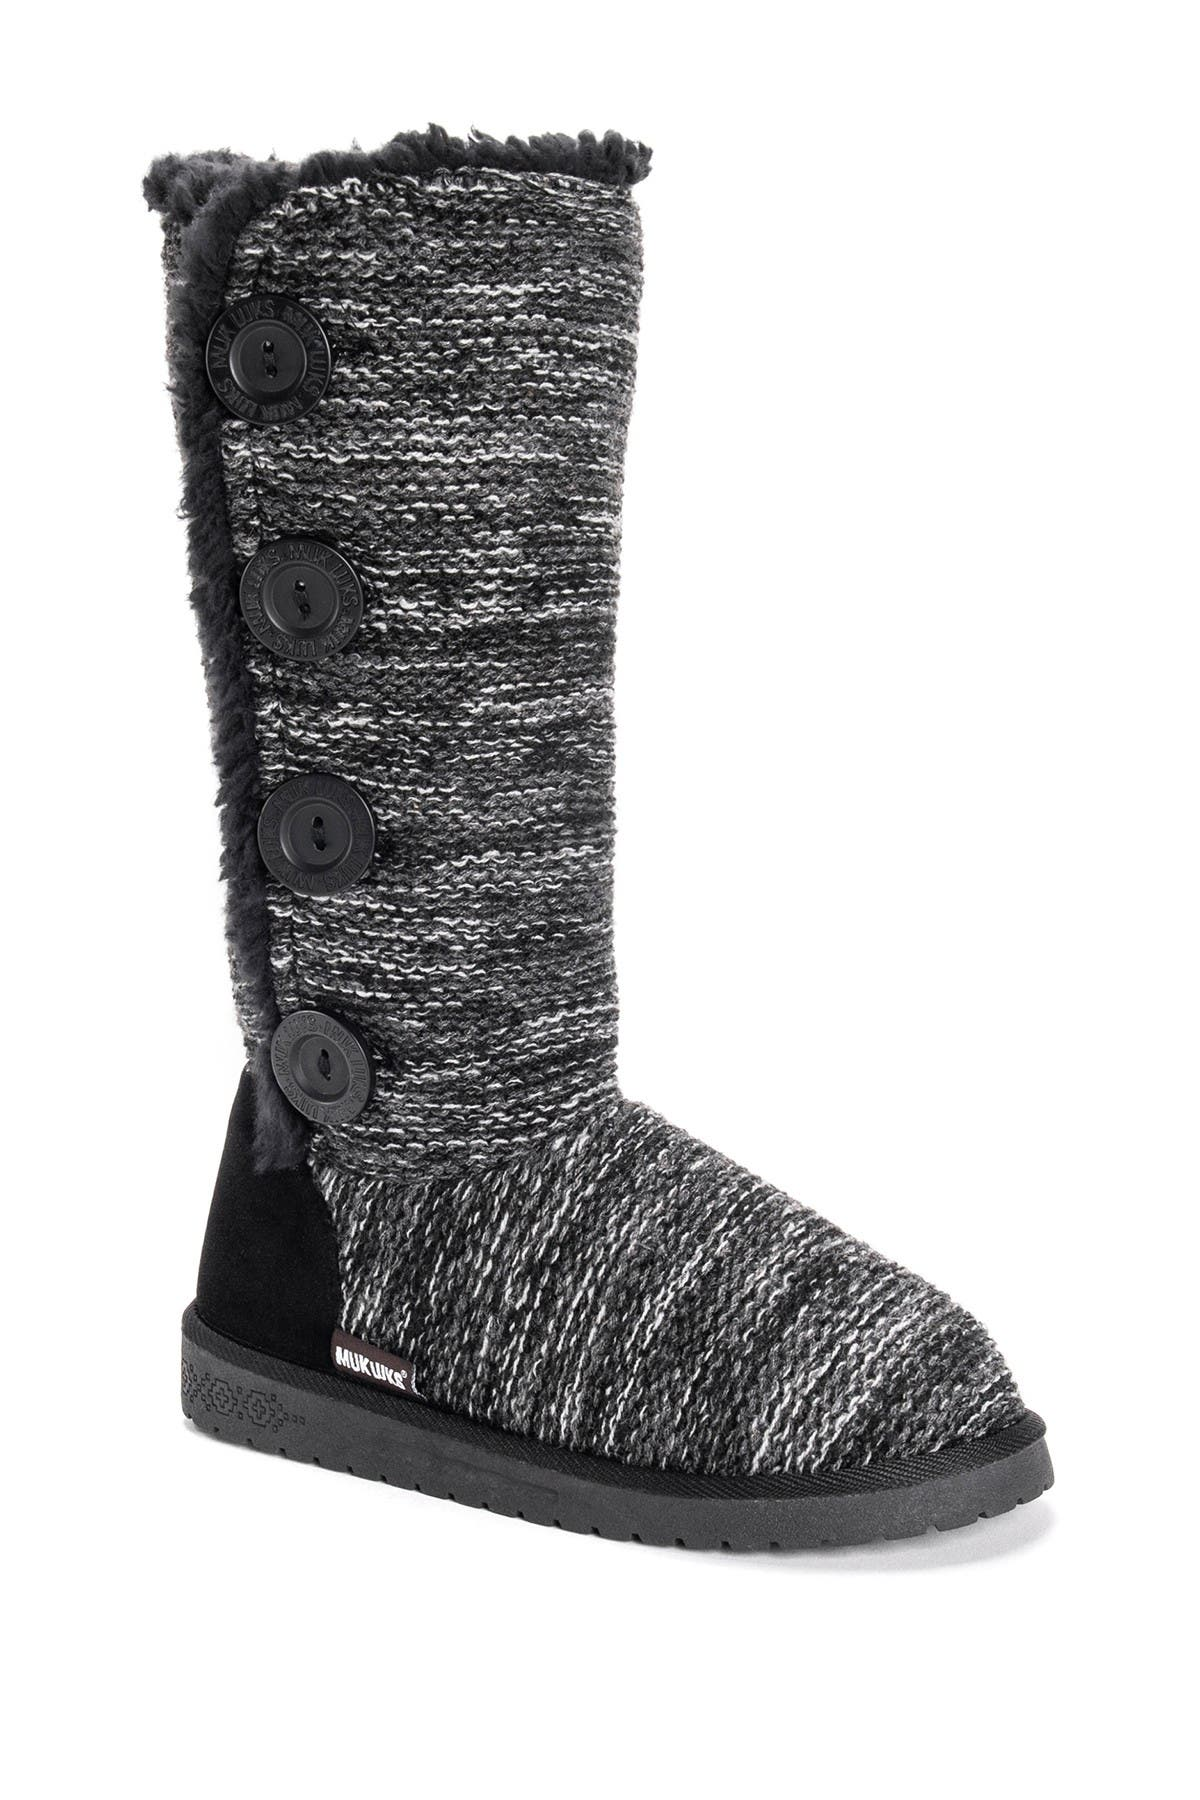 Image of MUK LUKS Liza Water-Resistant Faux Fur Knit Boot